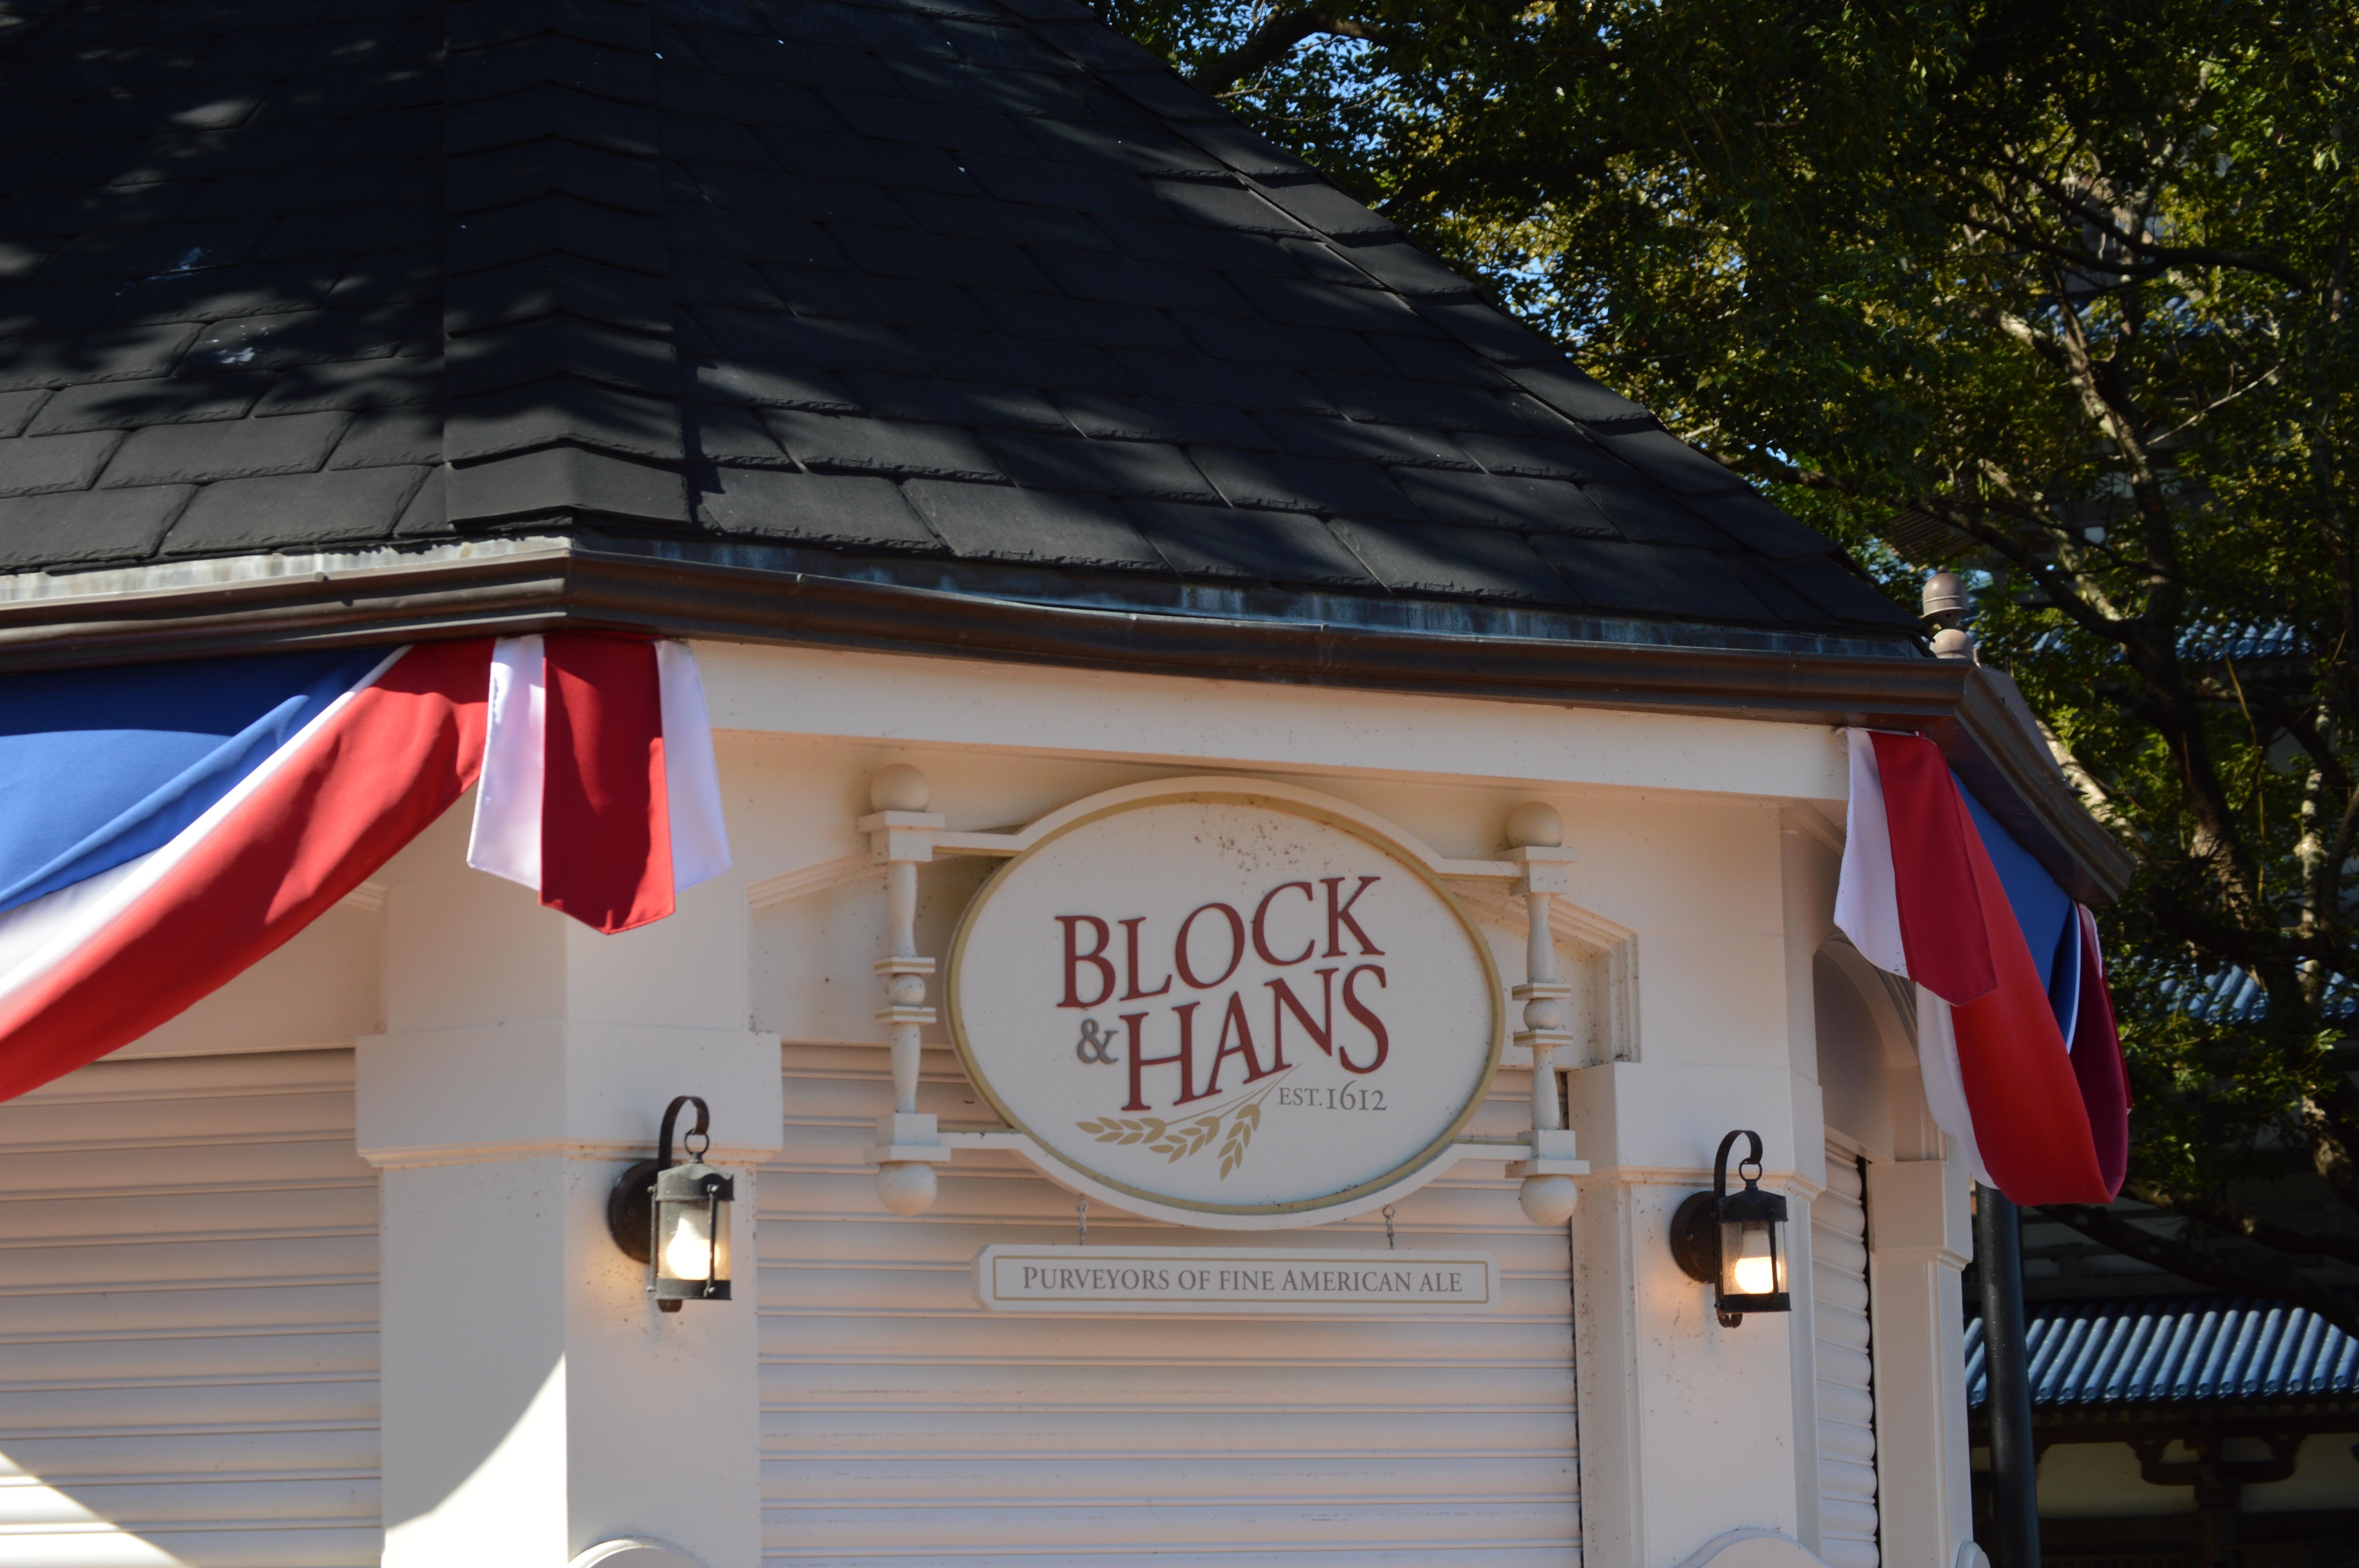 Block & Hans beverage stand at Epcot